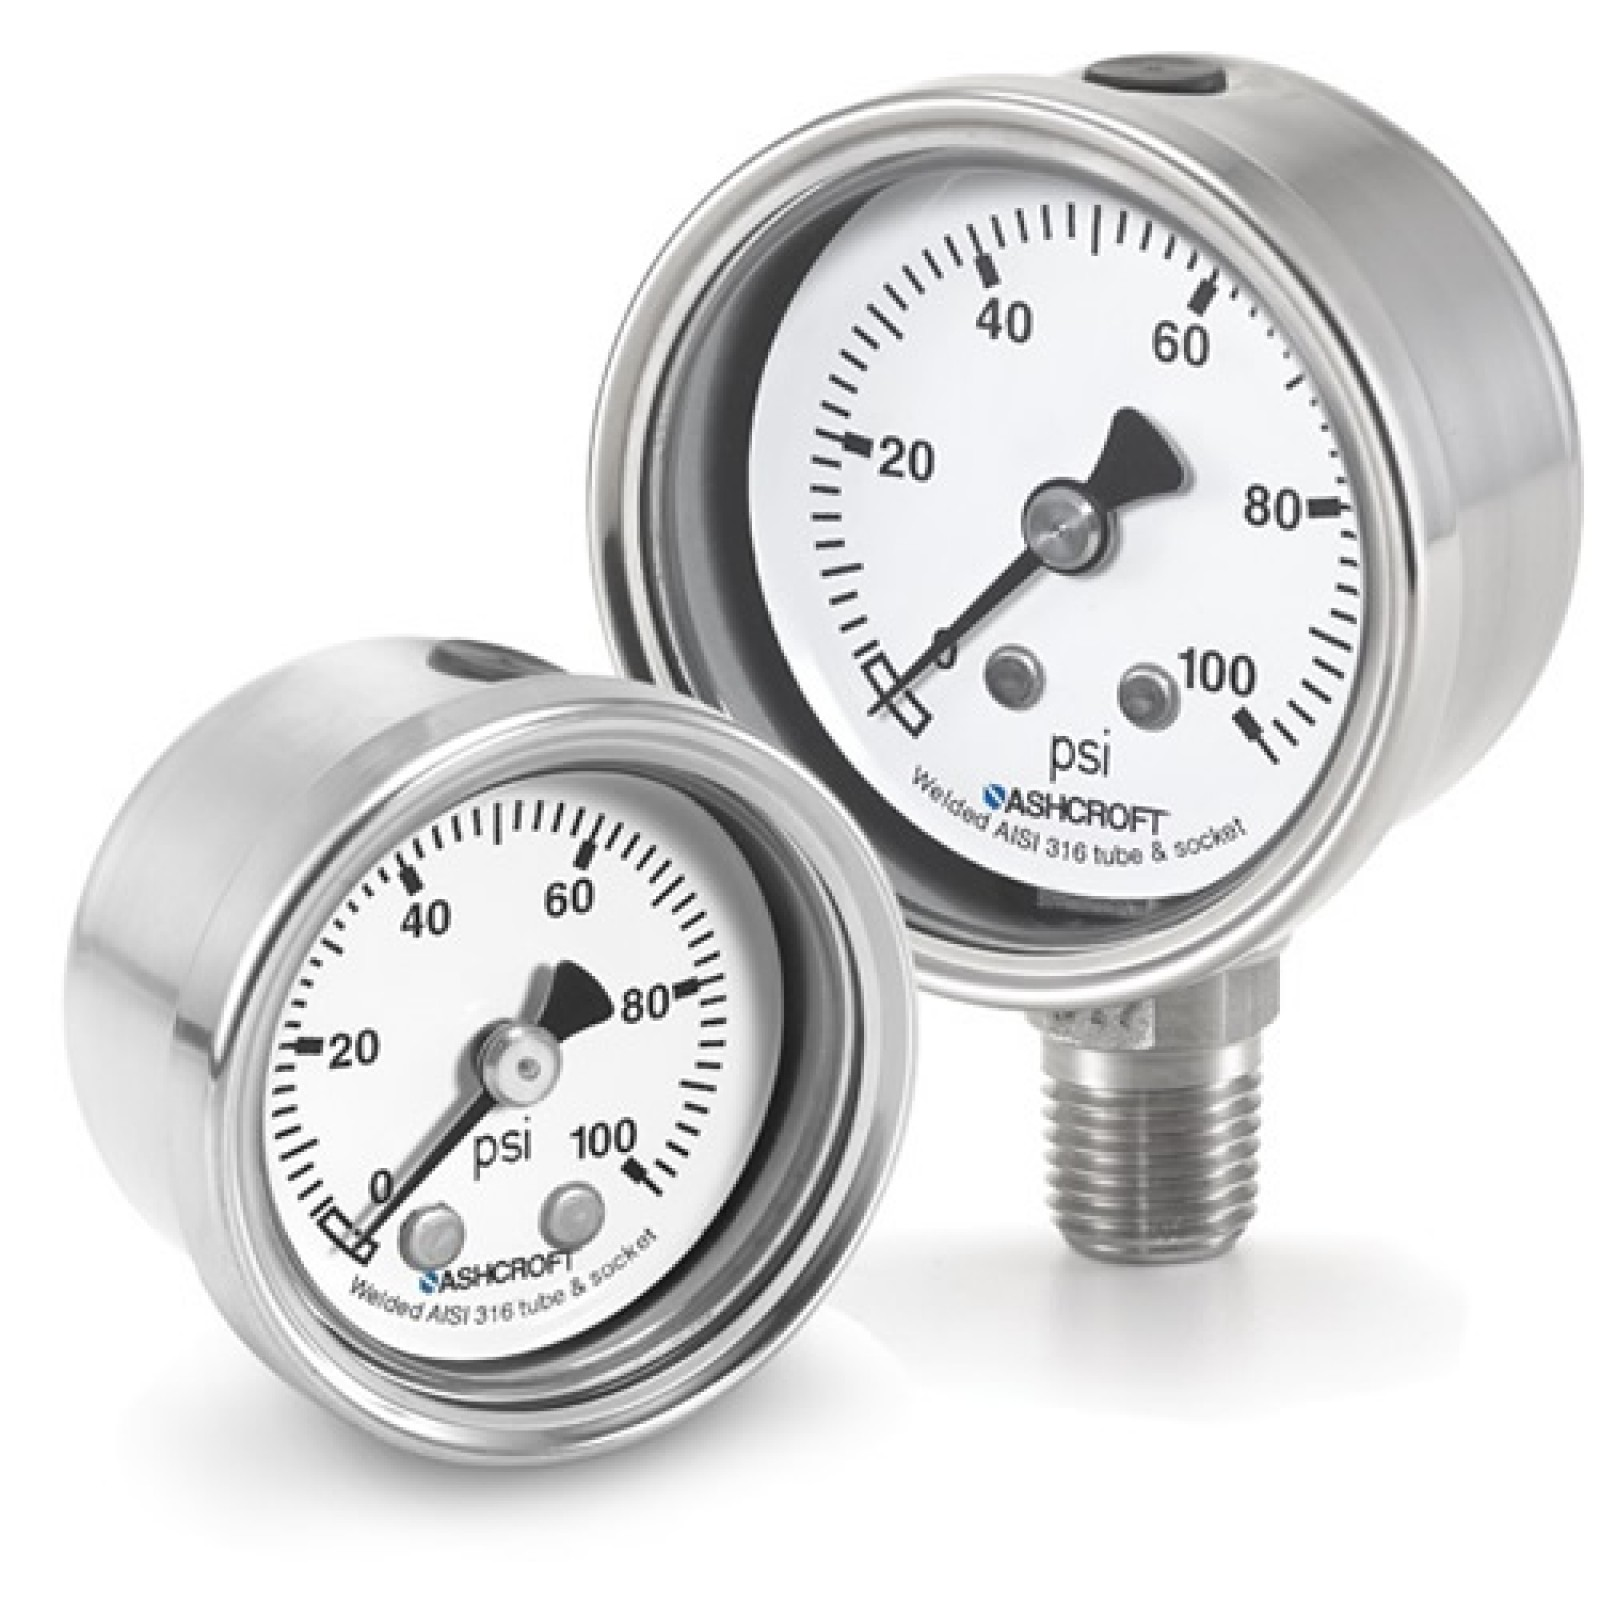 "63 1008S 02L XLL V/300#/KP - Pressure Gauge, 63mm stainless 1/4"" NPT Lower conn & Case, Plus Performance 30""hg/300 psi"